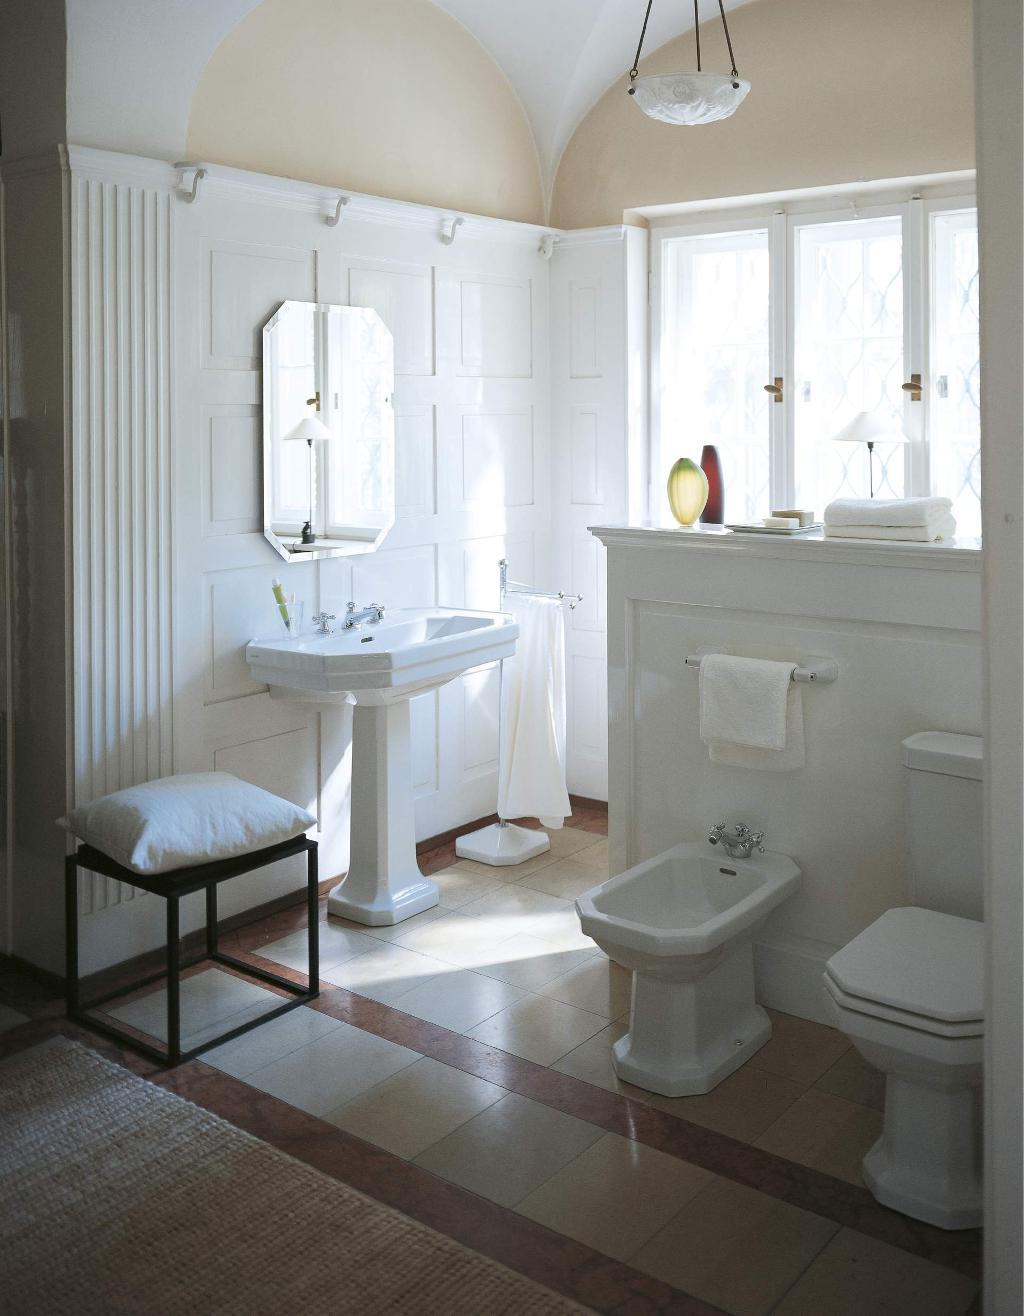 Duravit 1930 Series Toilets Sinks More Duravit